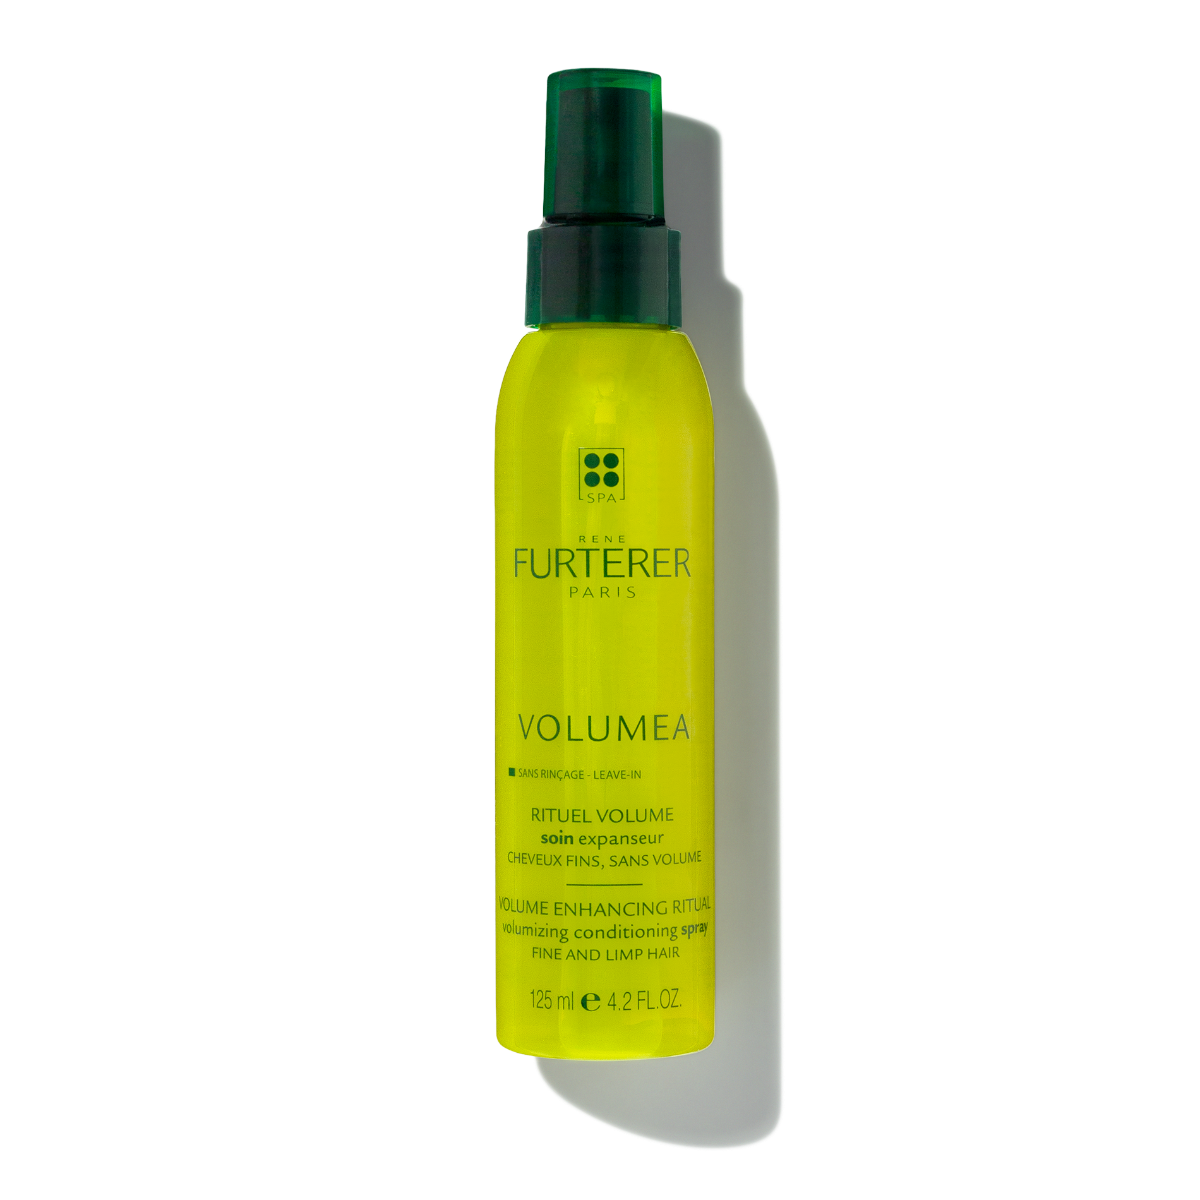 Rene Furterer VOLUMEA volumizing conditioning spray